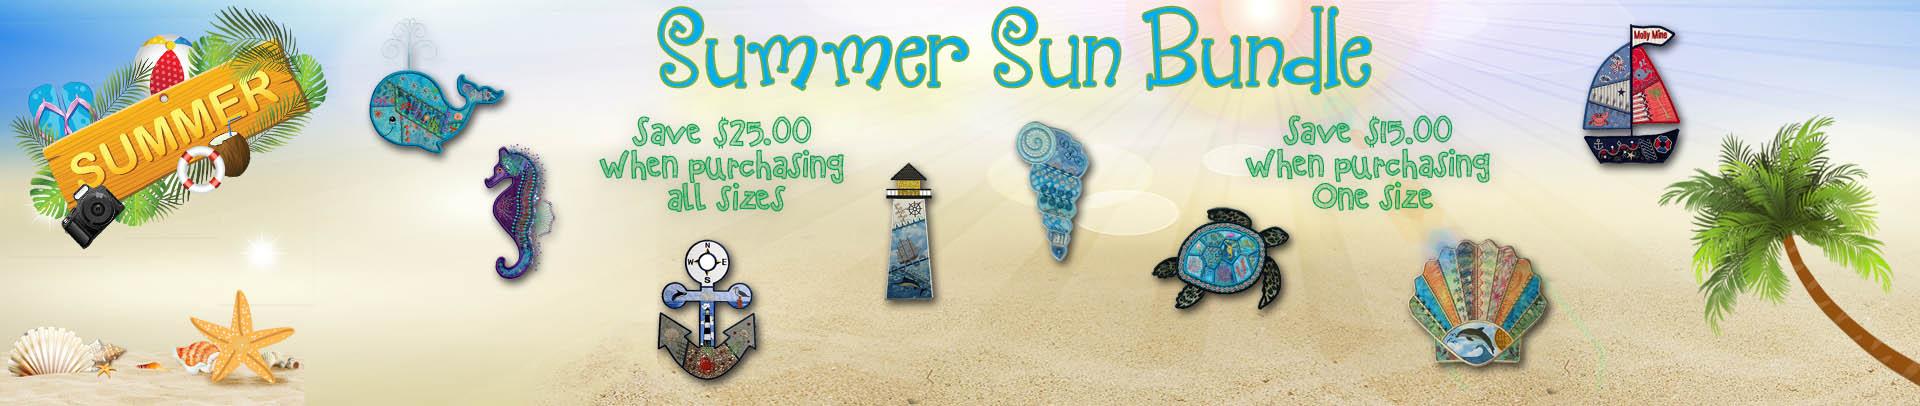 https://mollymine.com/product/crazy-quilt-summer-sun-bundle/